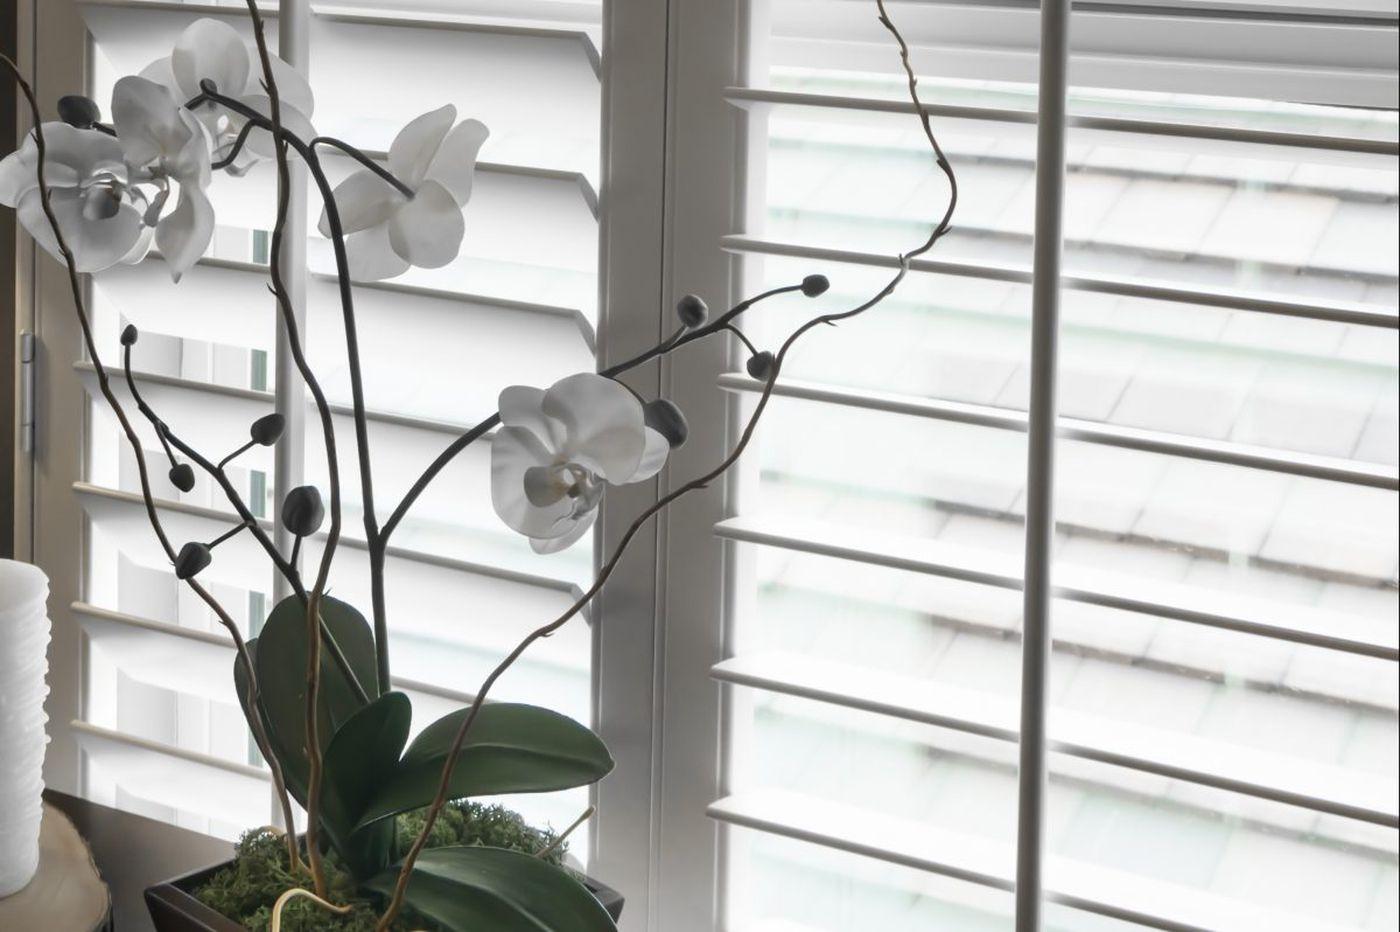 Ask Jennifer Adams: Window blinds or shades? Balancing privacy, sun shades and views